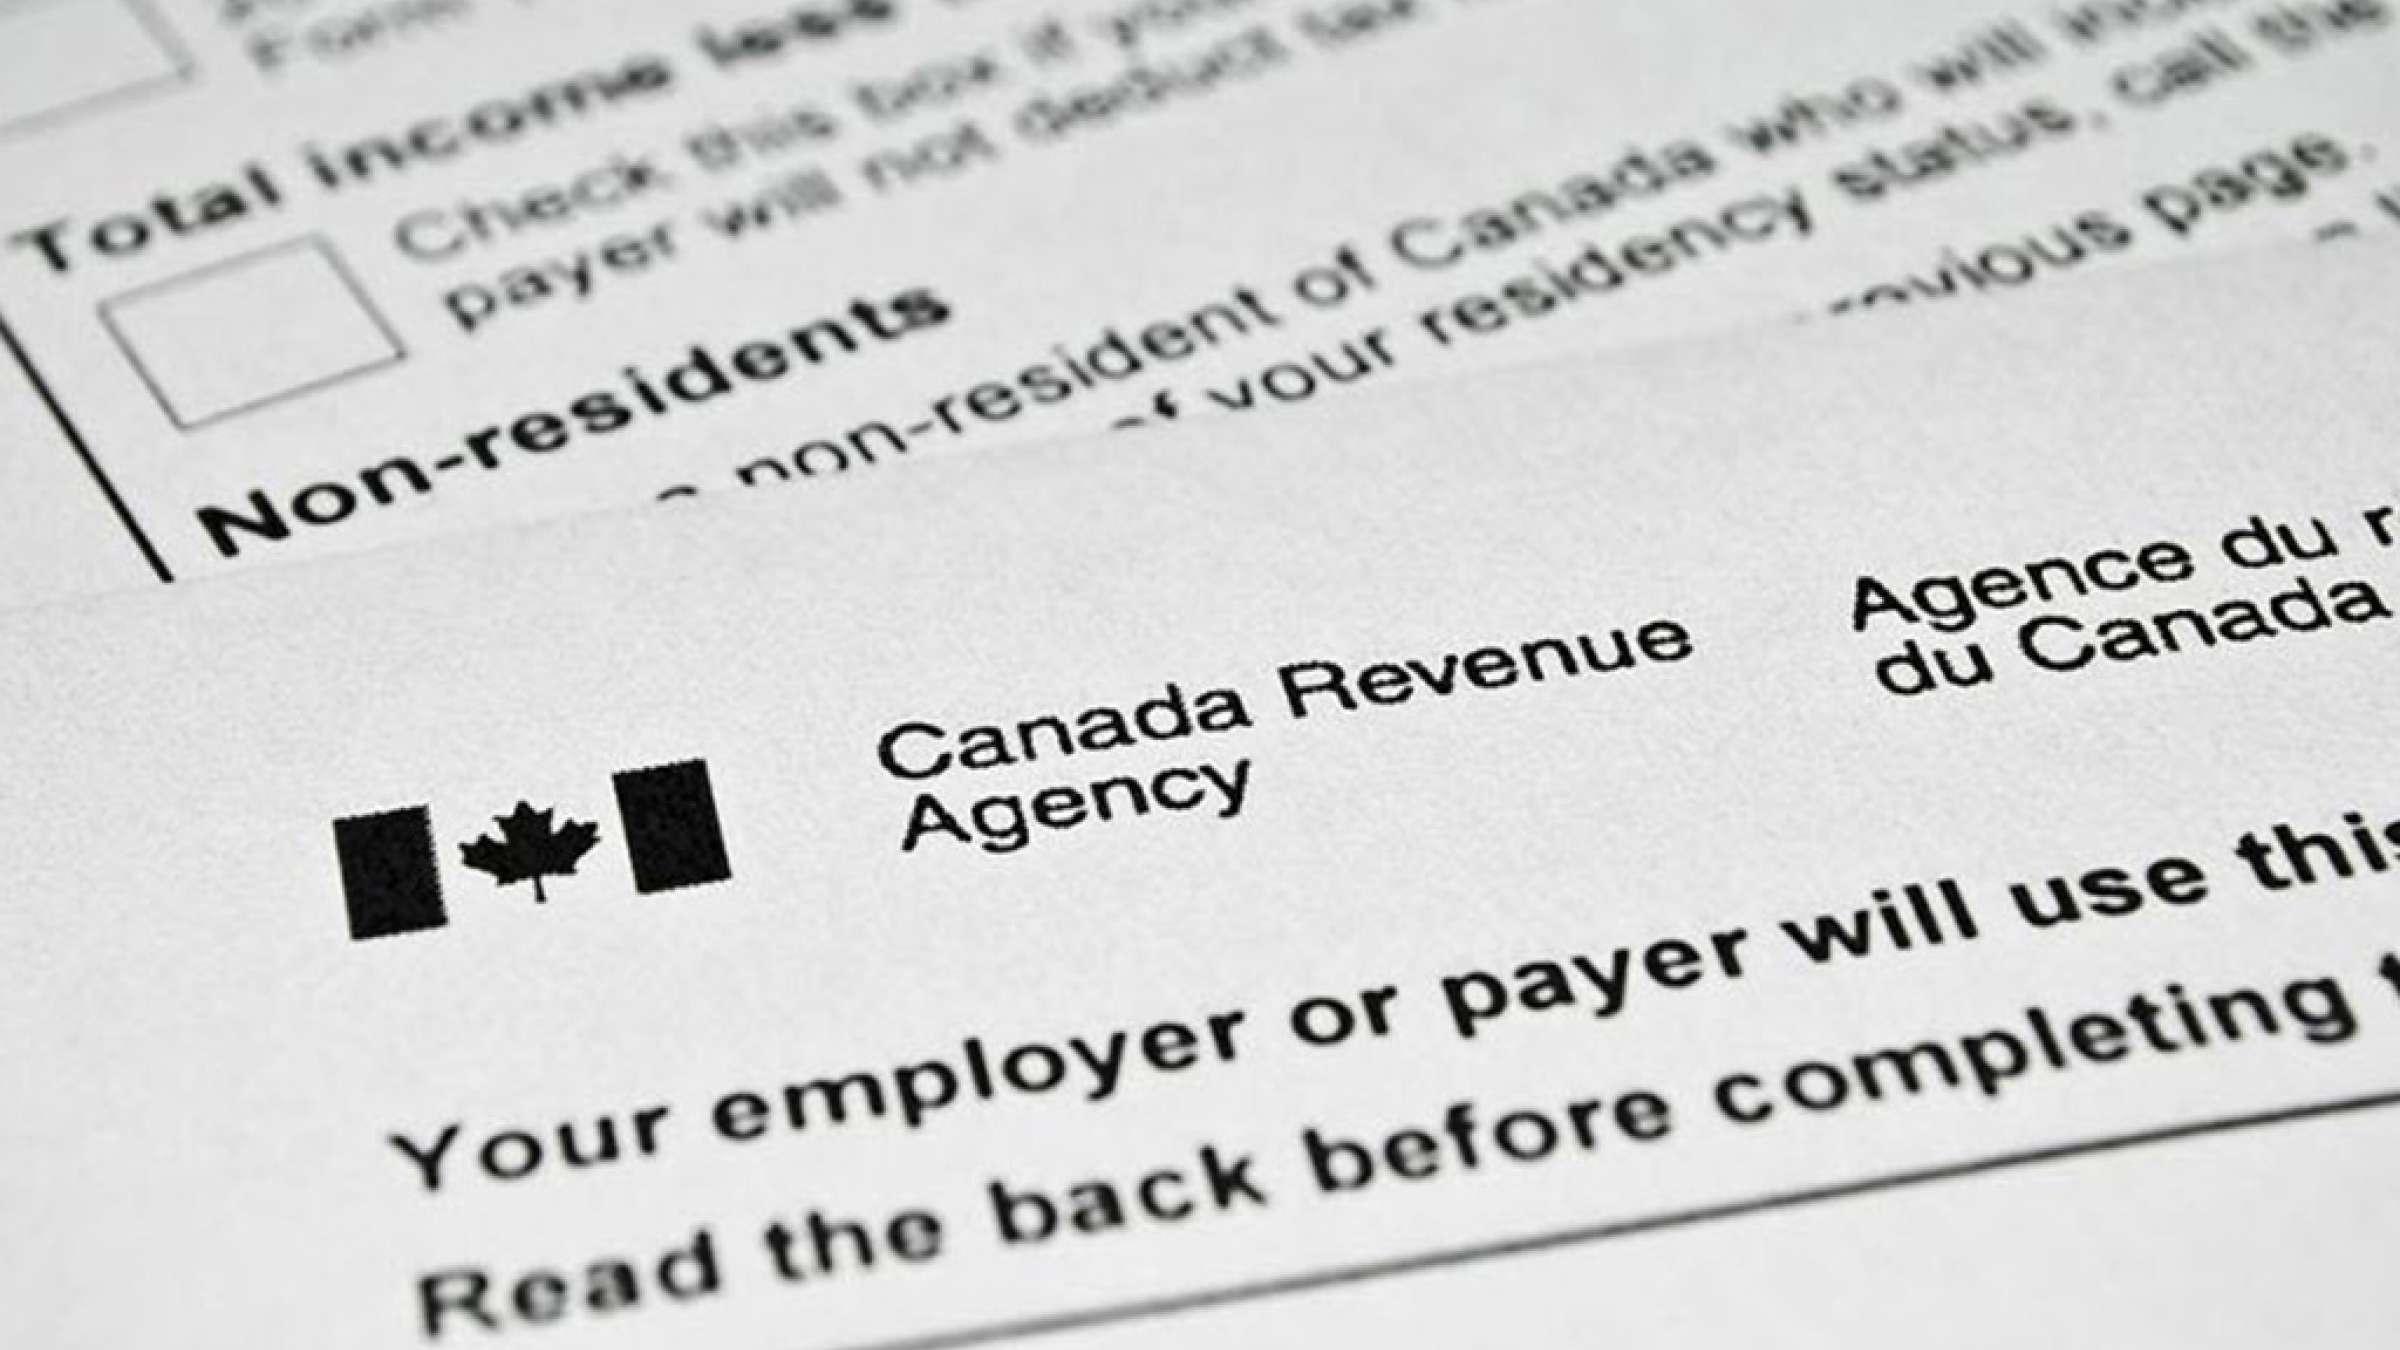 اخبار-کانادا-تاریخ-پُر-کردن-اظهارنامه-مالیاتی-کانادایی-ها-عقب-افتاد